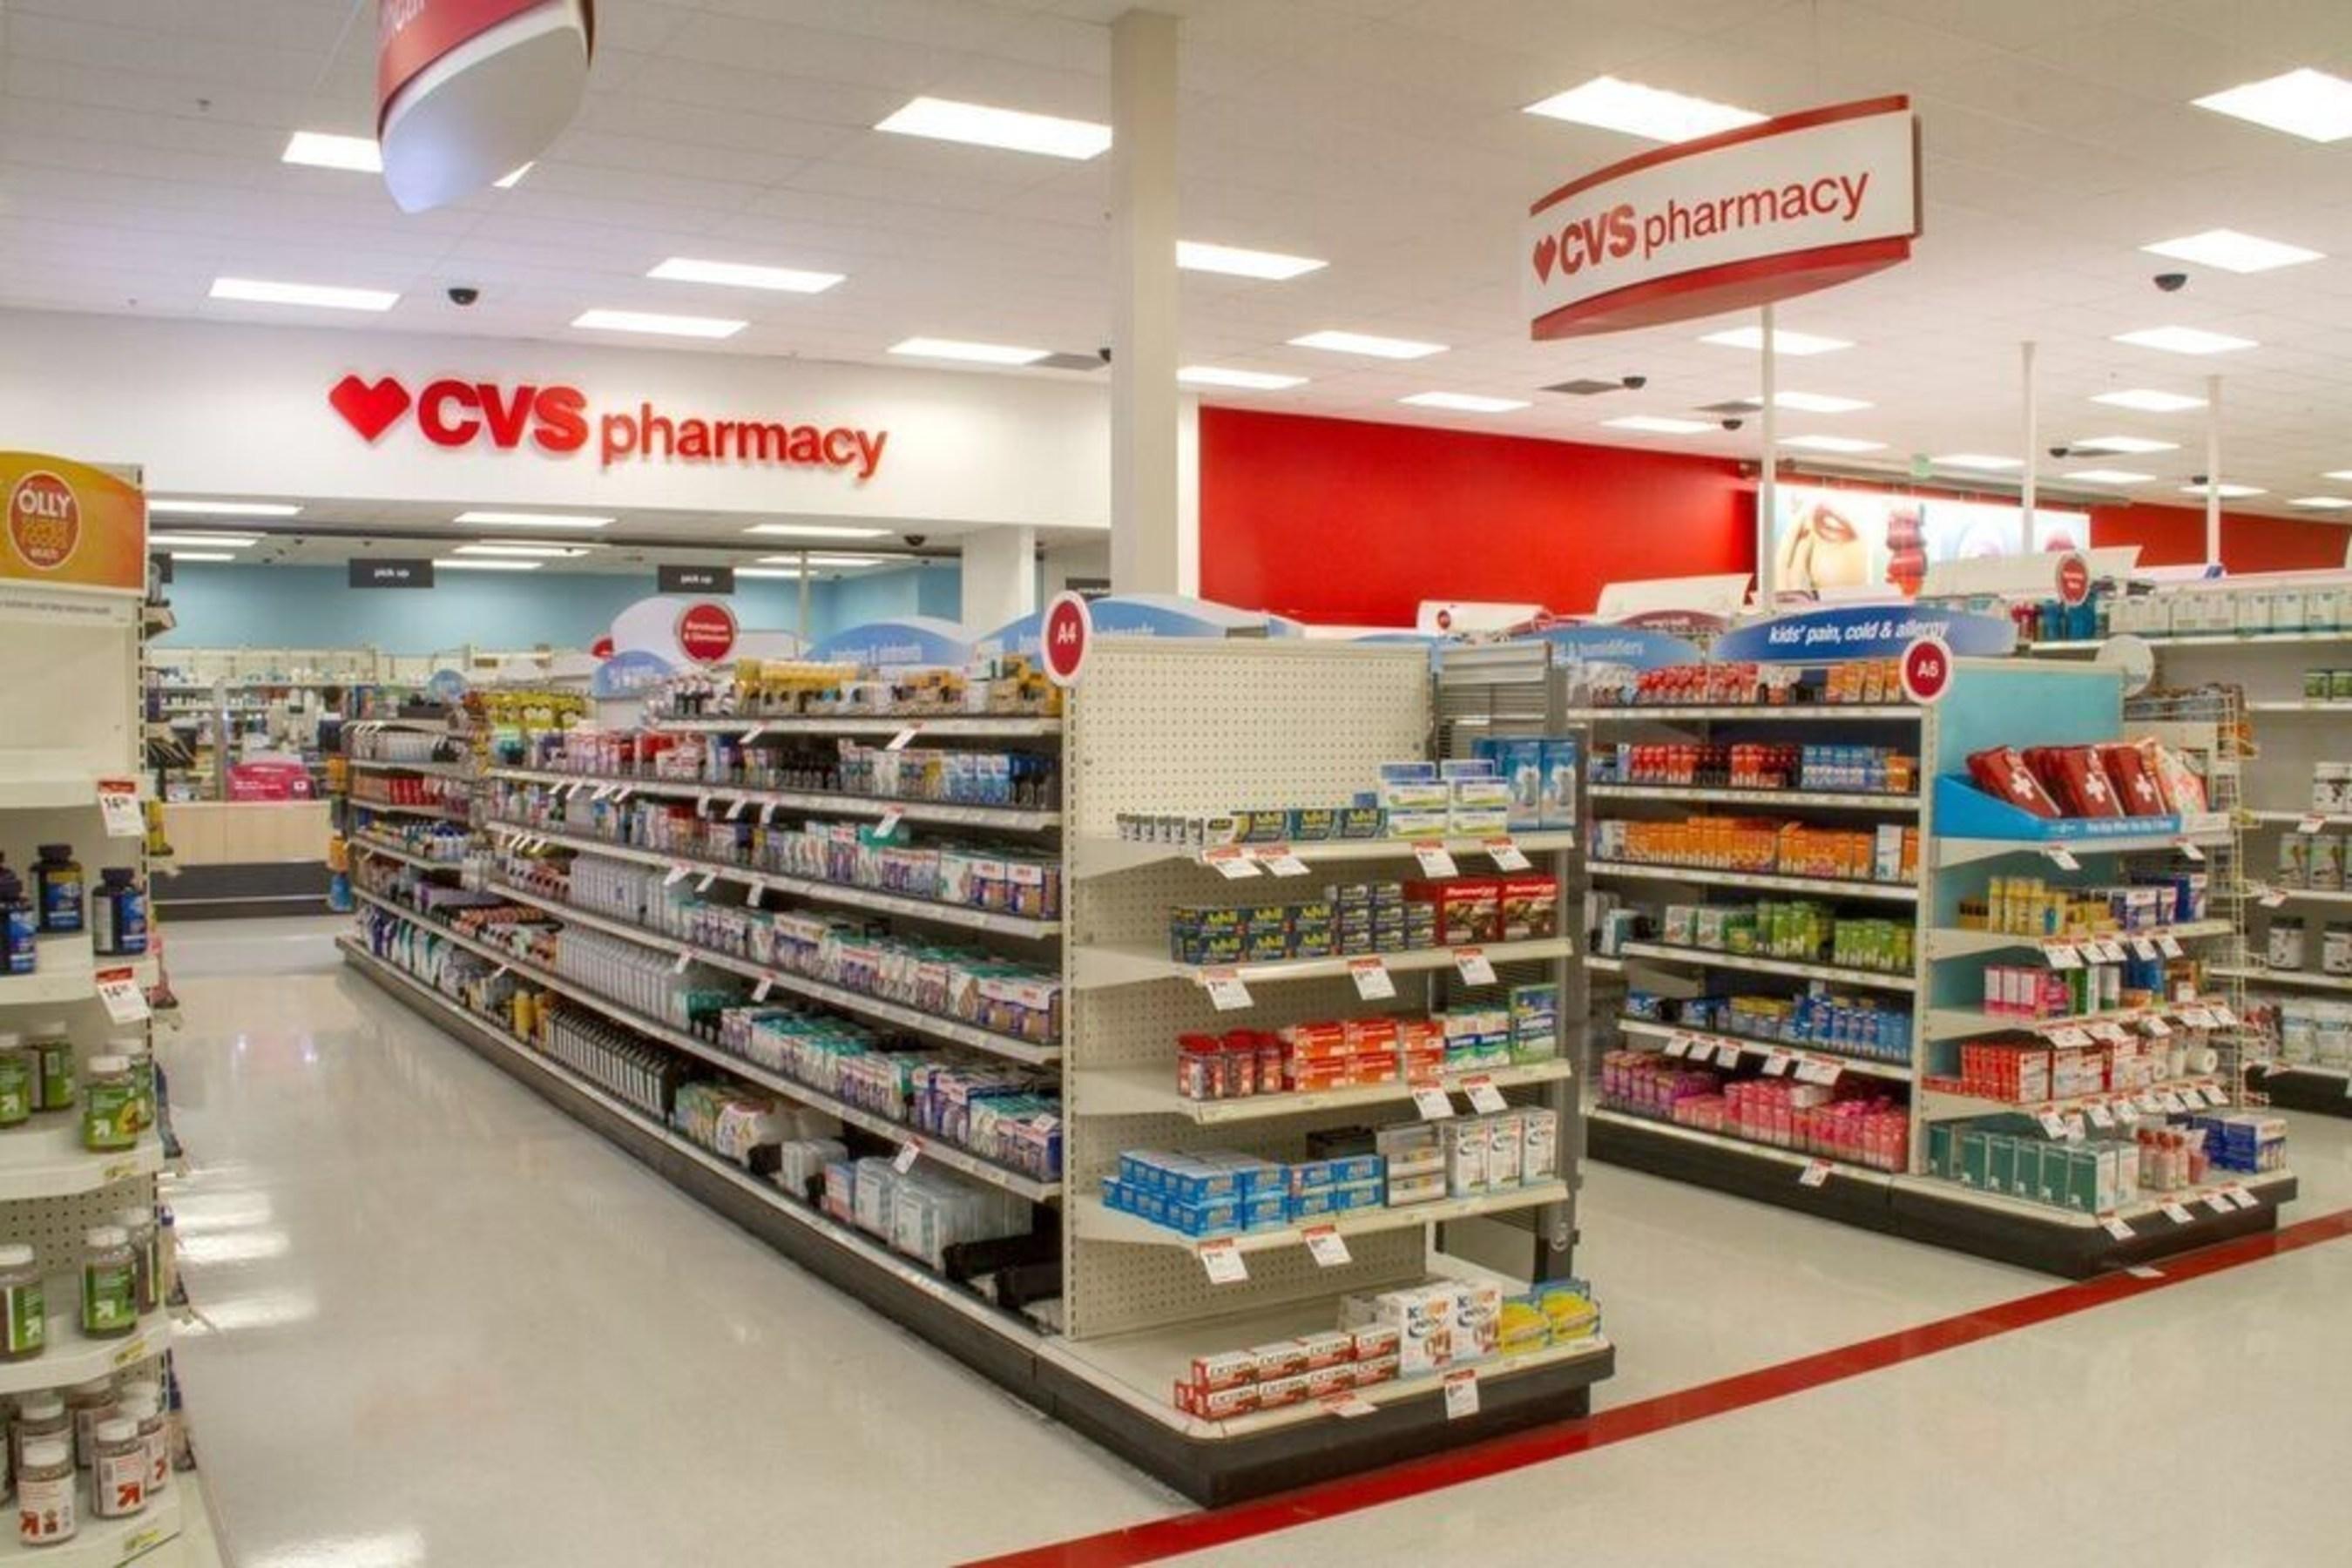 CVS Pharmacy in Target debuts in Salt Lake City, UT